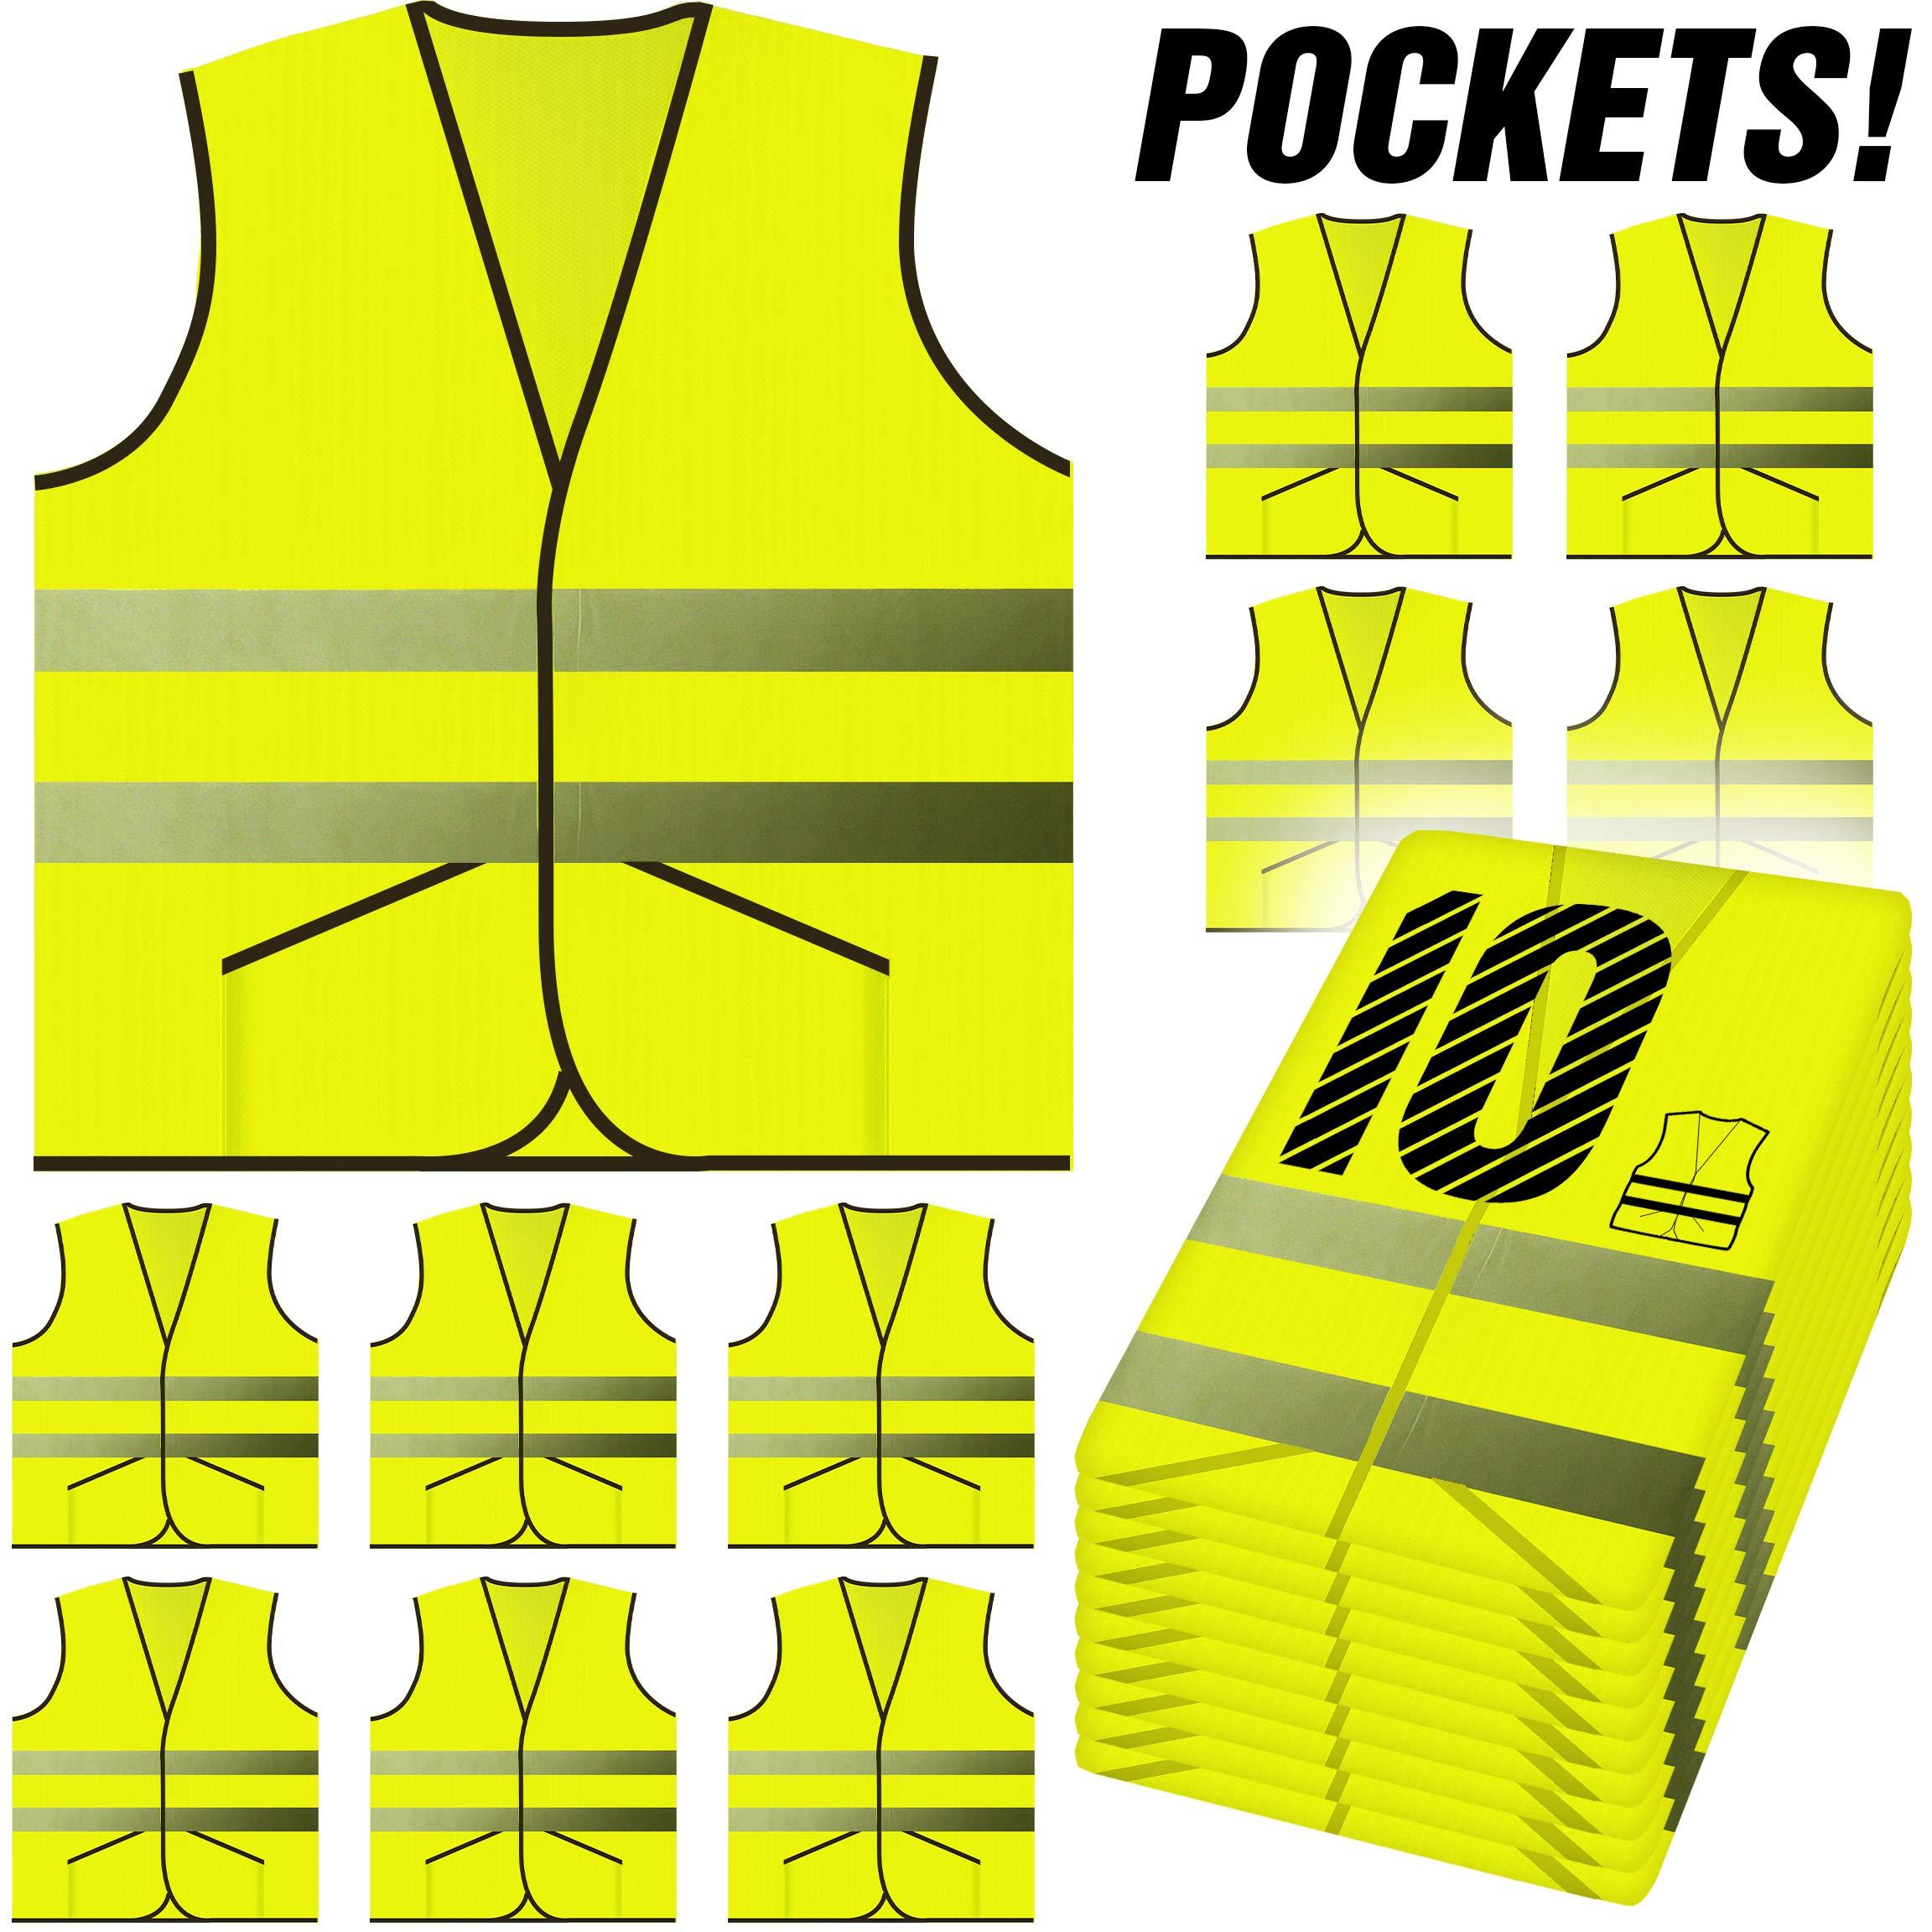 PeerBasics, Pocket Safety Vest 10 Pack, Yellow Reflective High Visibility, Hi Vis Silver Strip, Men Women, Work, Cycling, Runner, Surveyor, Volunteer, Crossing Guard, Road, Construction (Knitted, 10)